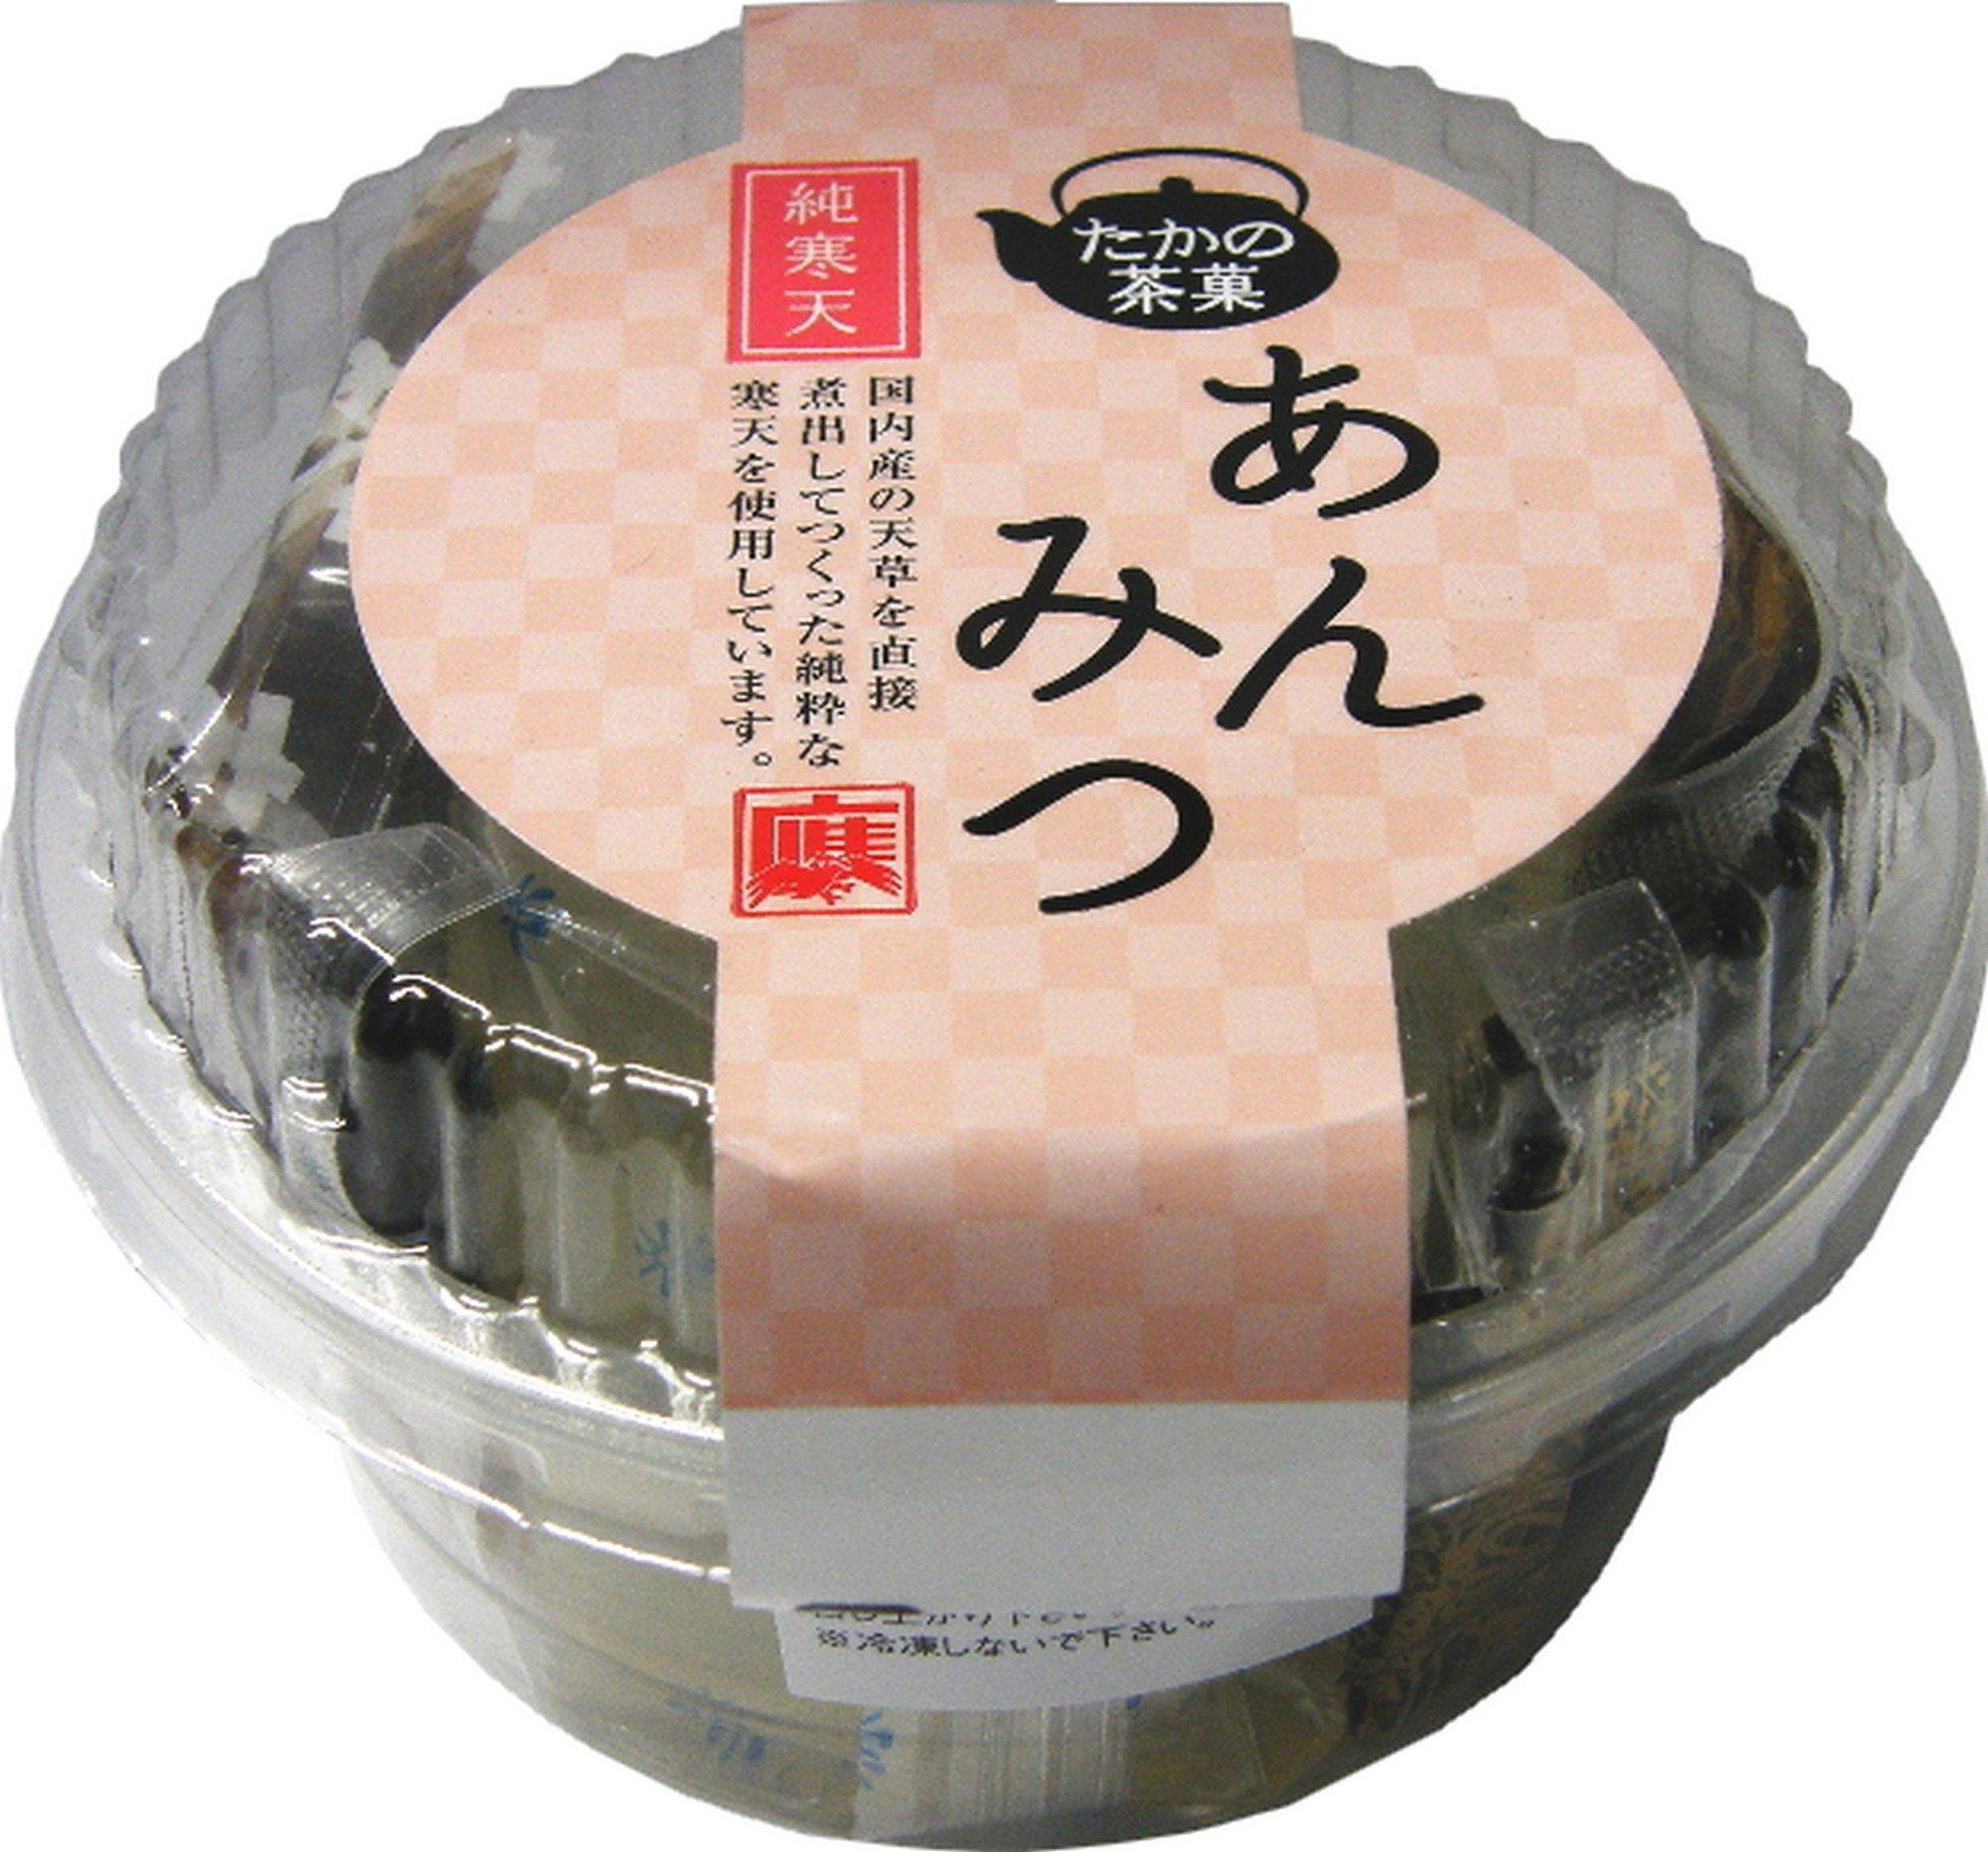 Takano refreshments pure agar Anmitsu 175gX8 pieces by Azabu Takano